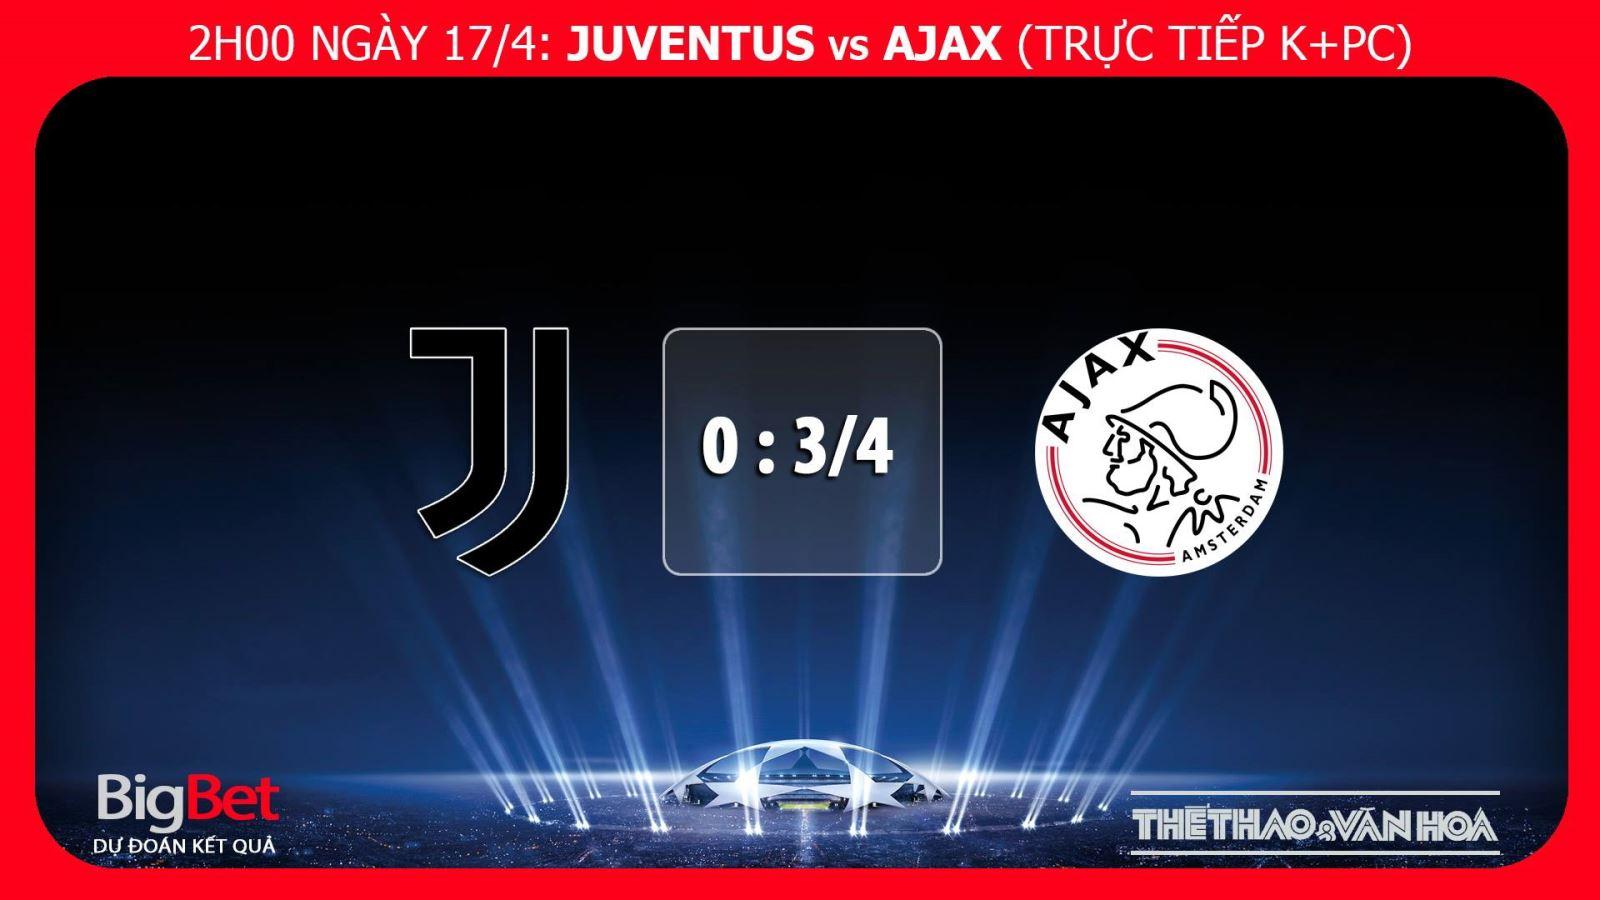 soi kèo Juventus vs Ajax, trực tiếp bóng đá, trực tiếp Juventus vs Ajax, Juventus, Ajax, xem trực tiếp Juventus vs Ajax ở đâu